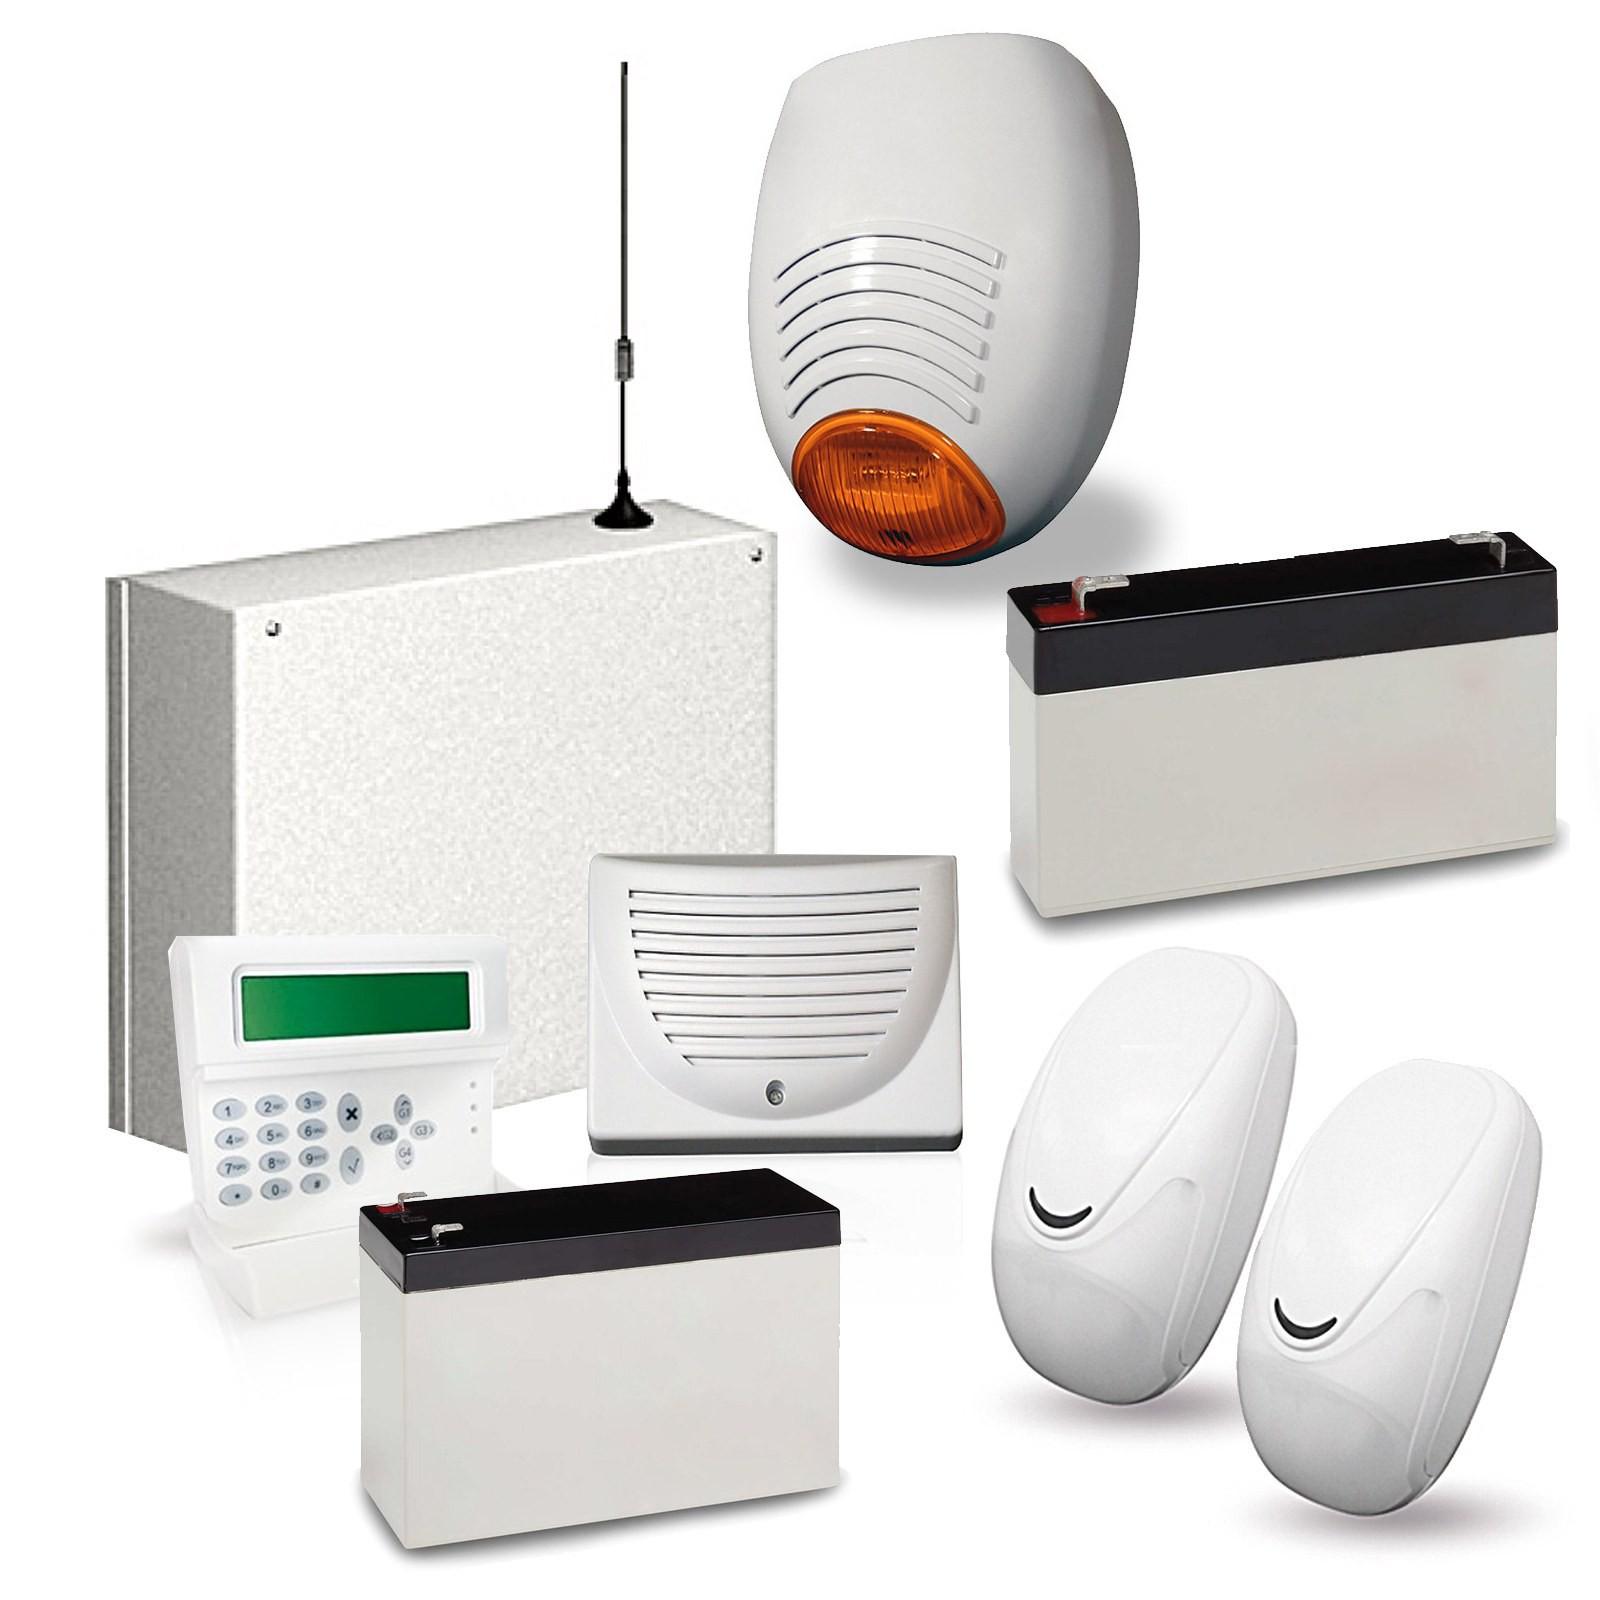 Kit Antifurto Allarme Casa Combinatore GSM Cellulare con Batterie AMC C24 GSM Vultech Life AMC ...